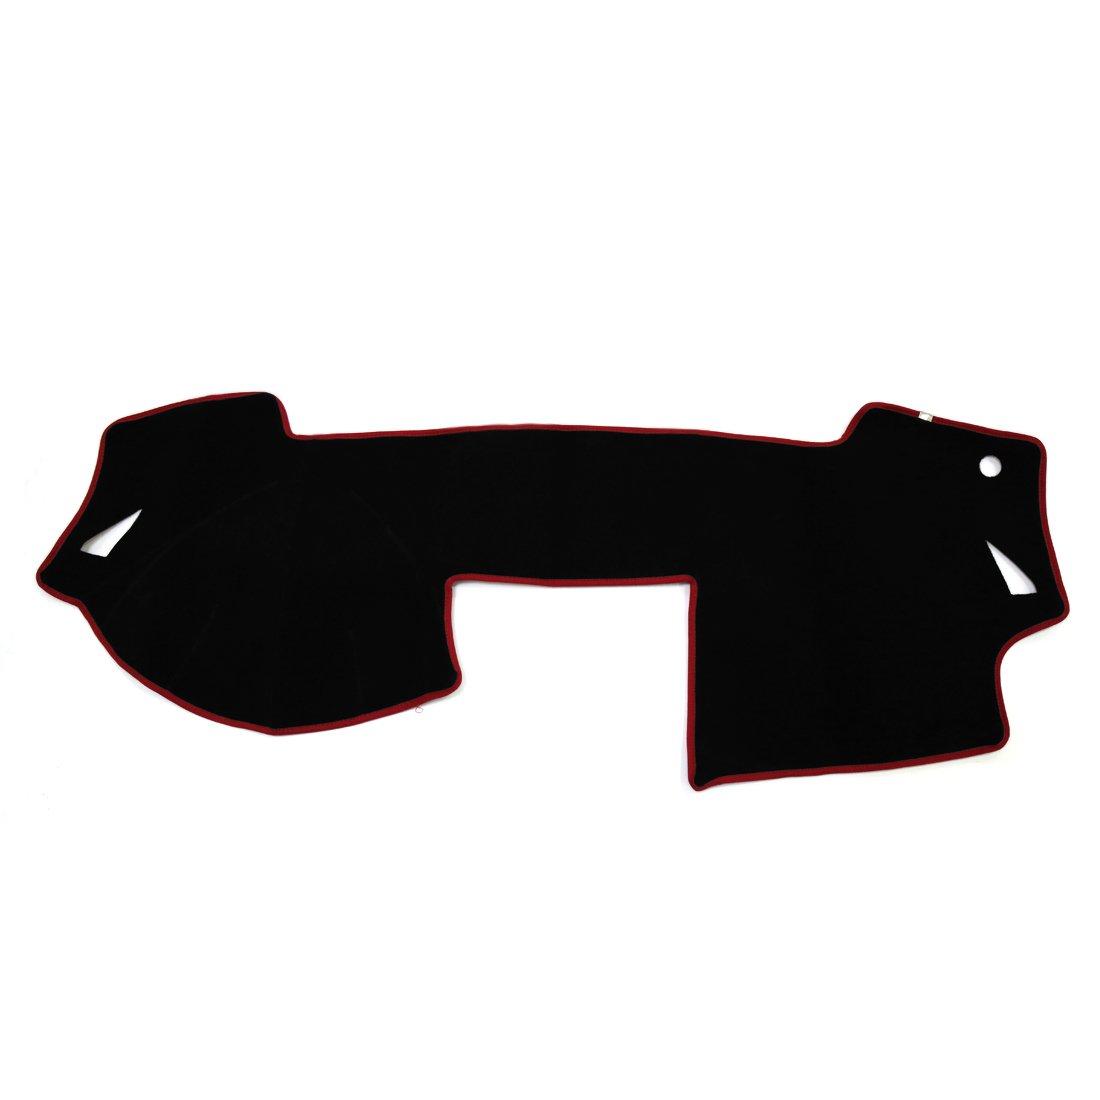 uxcell Car Inner Dash Sun Cover Dashboard Dashmat Mat Carpet Pad for Mazda 6 Atenza